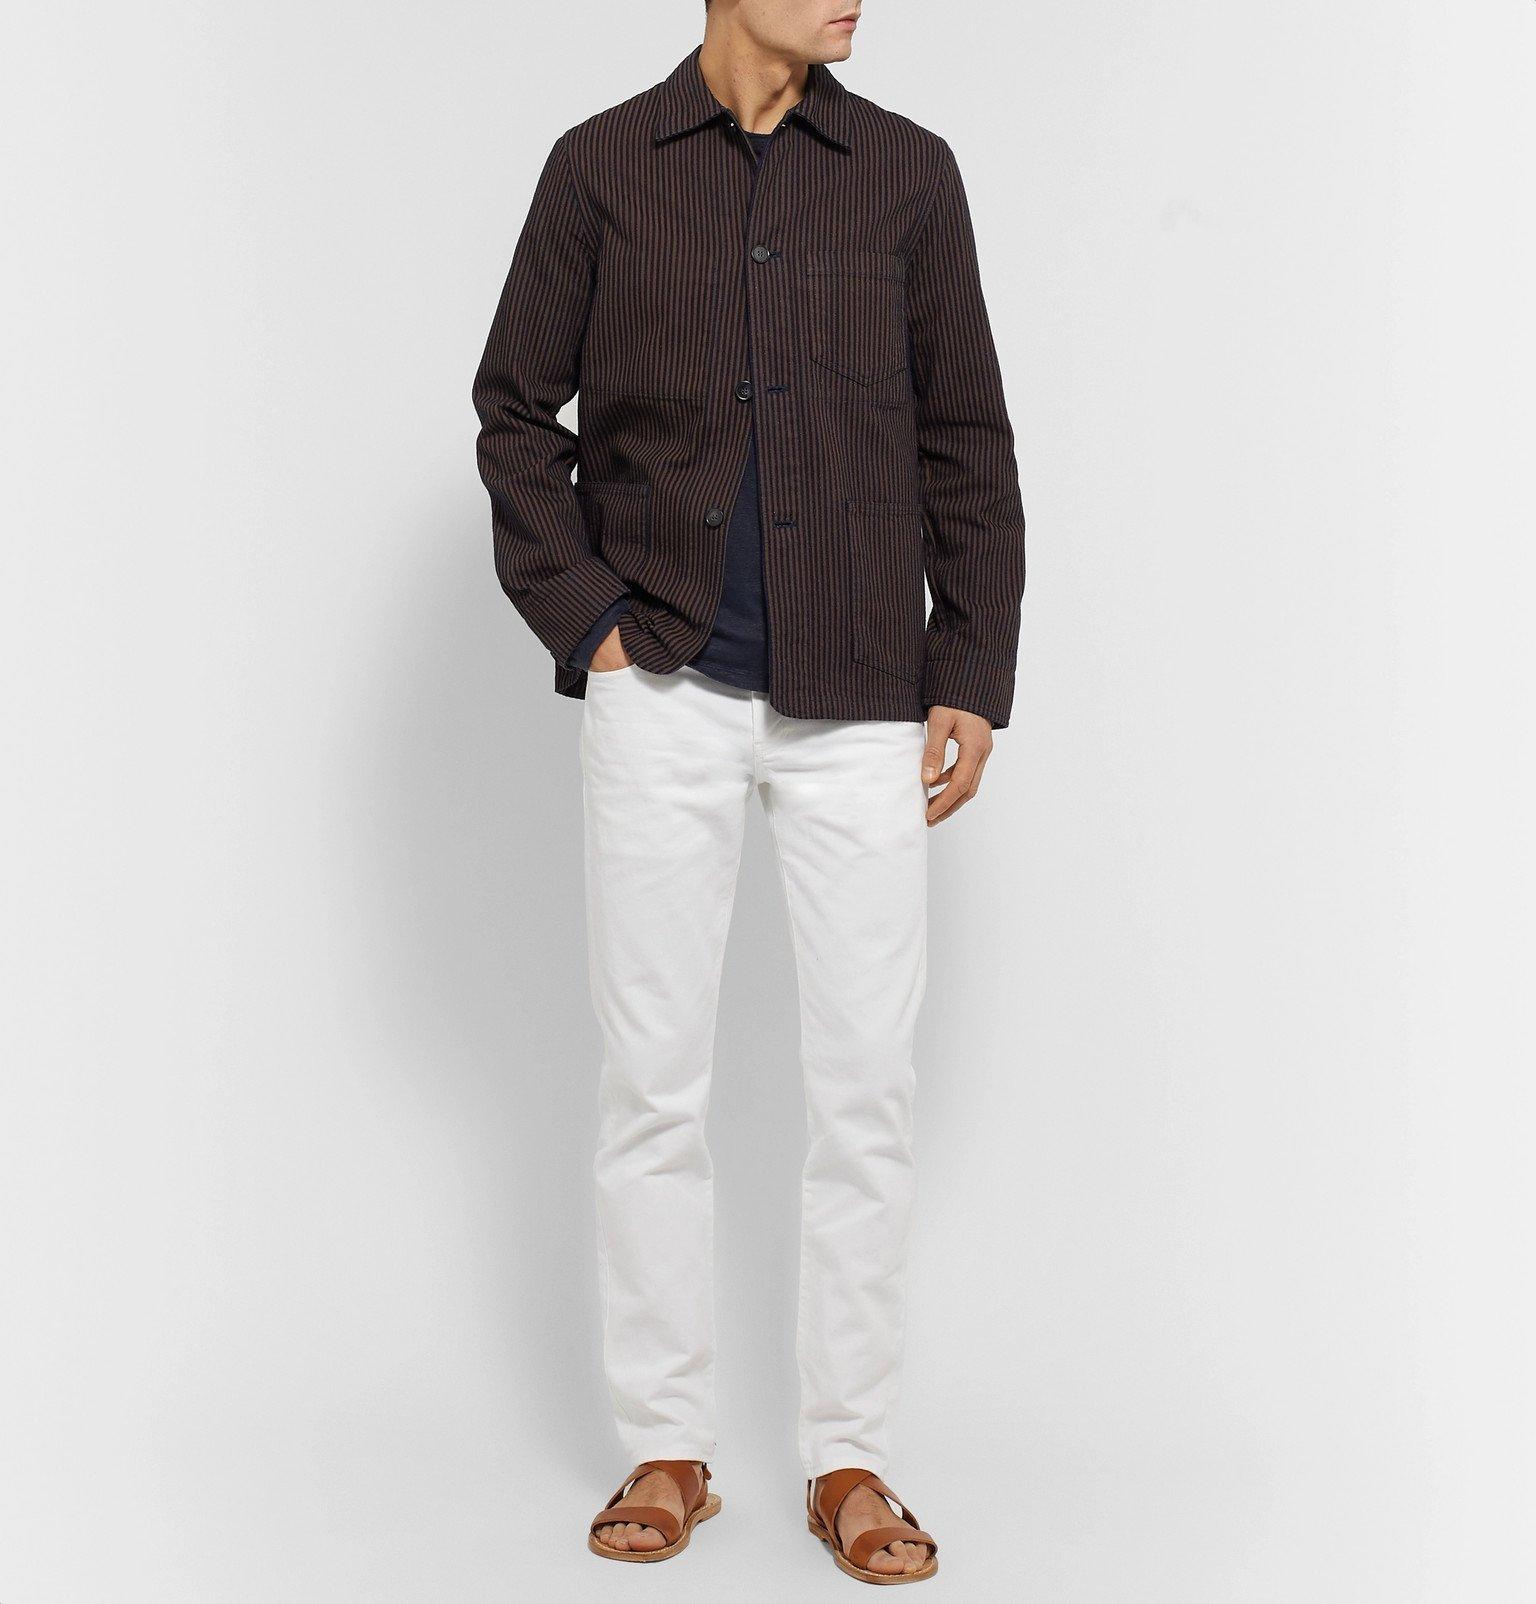 Officine Generale - Indigo-Dyed Striped Cotton Chore Jacket - Brown